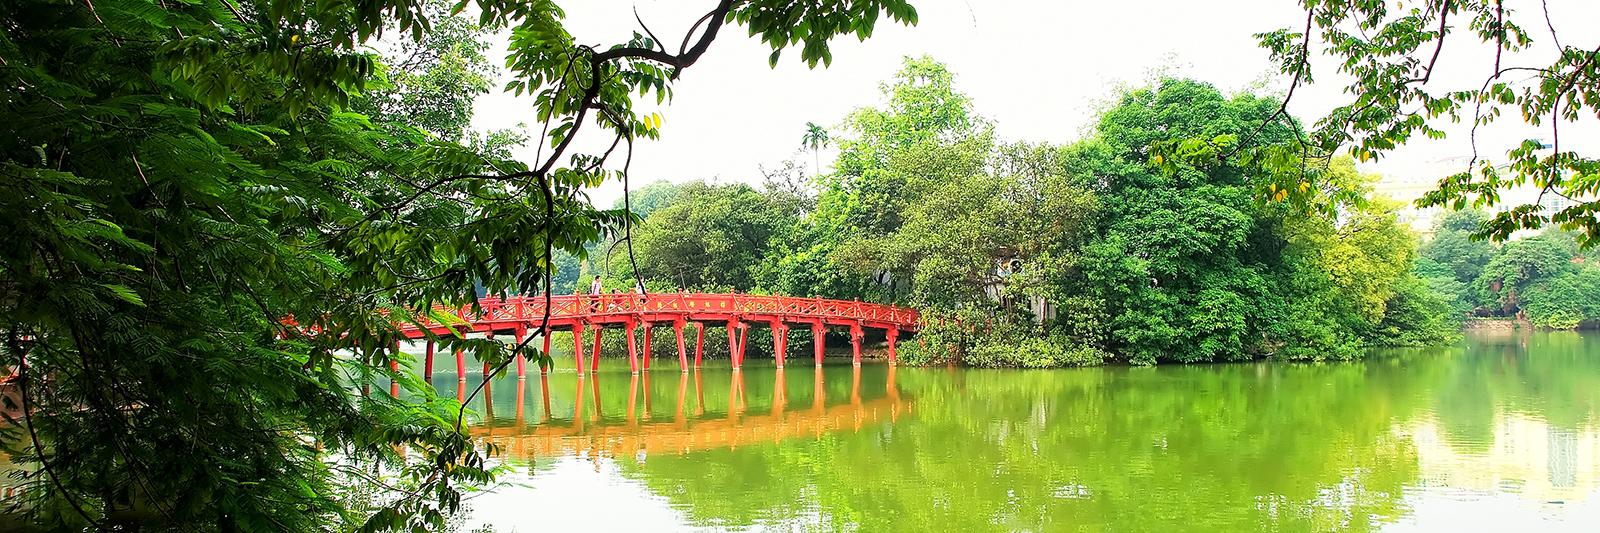 Hilton Garden Inn - Hanoi